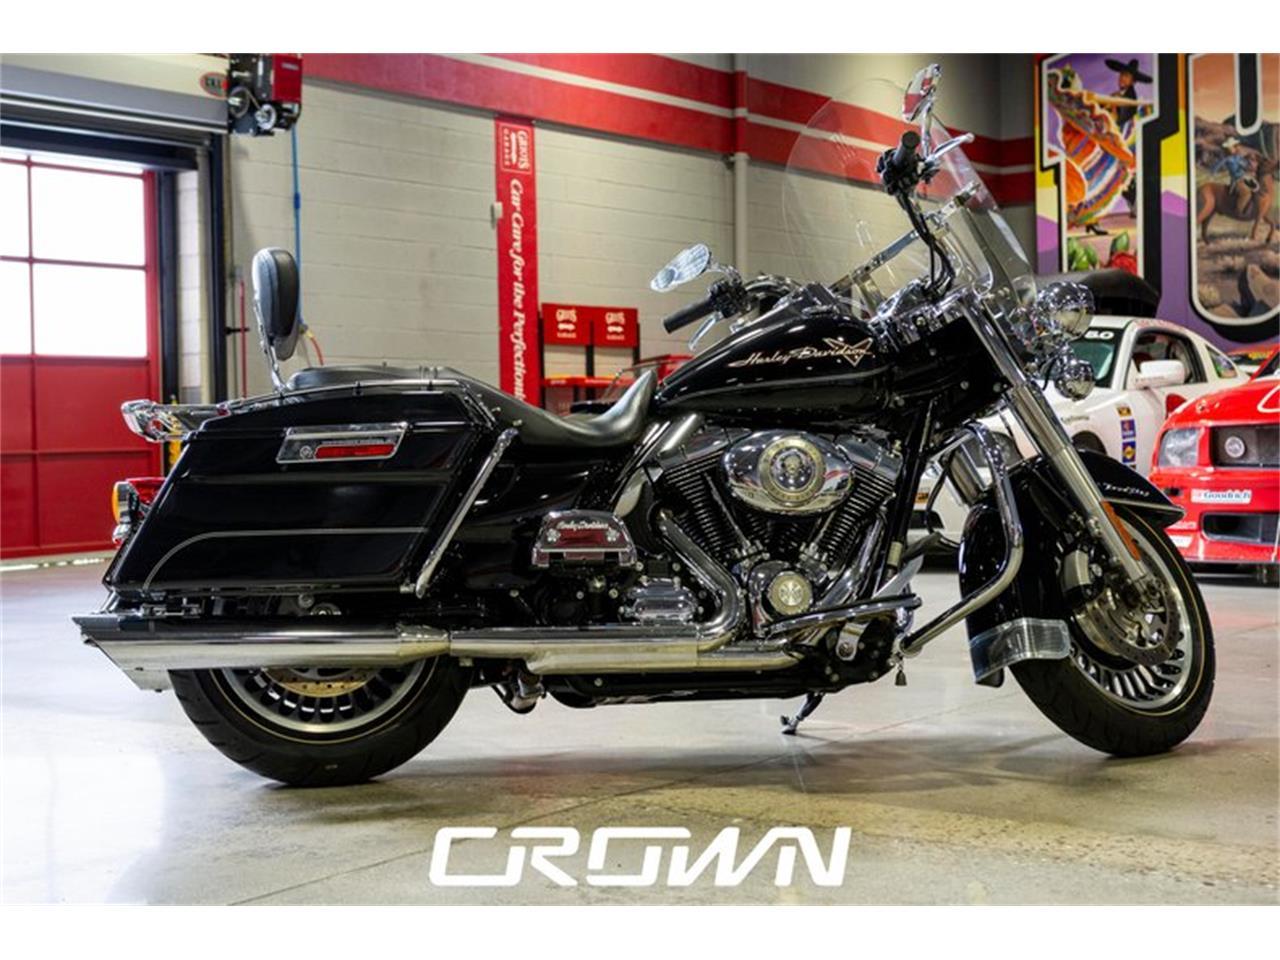 2011 Harley-Davidson Road King (CC-1391141) for sale in Tucson, Arizona